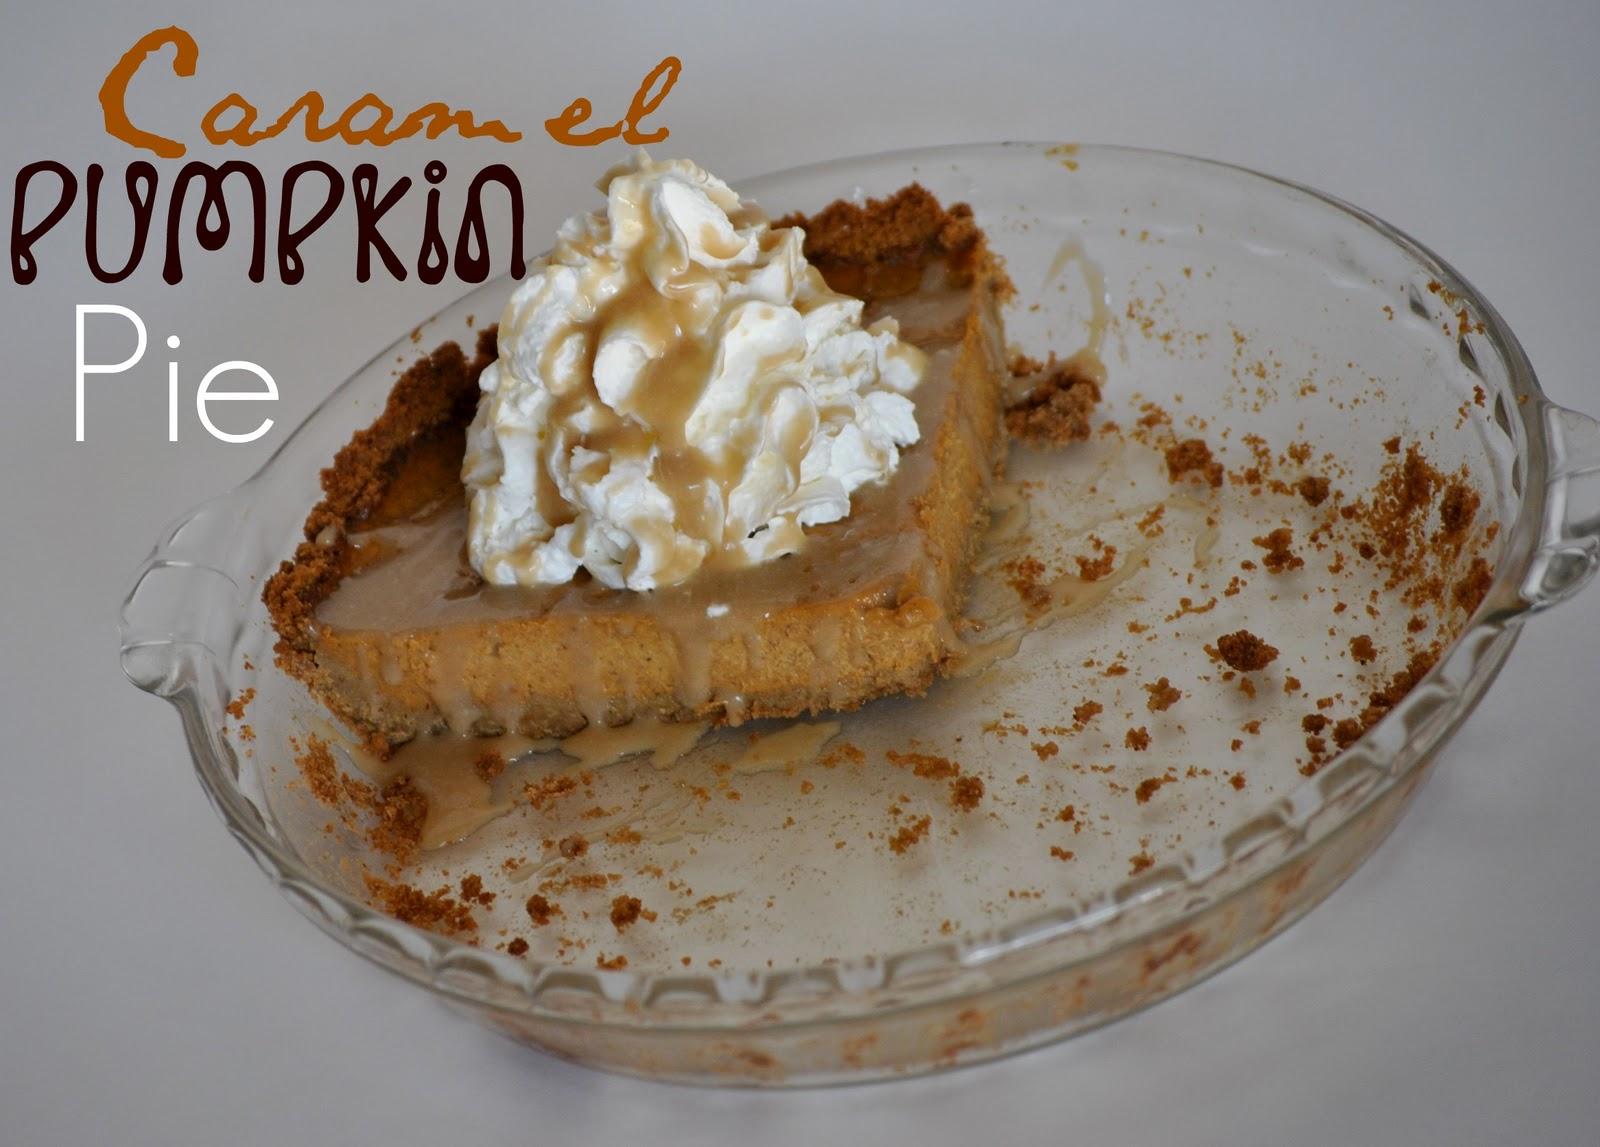 The Farm Girl Recipes: Caramel Pumpkin Pie